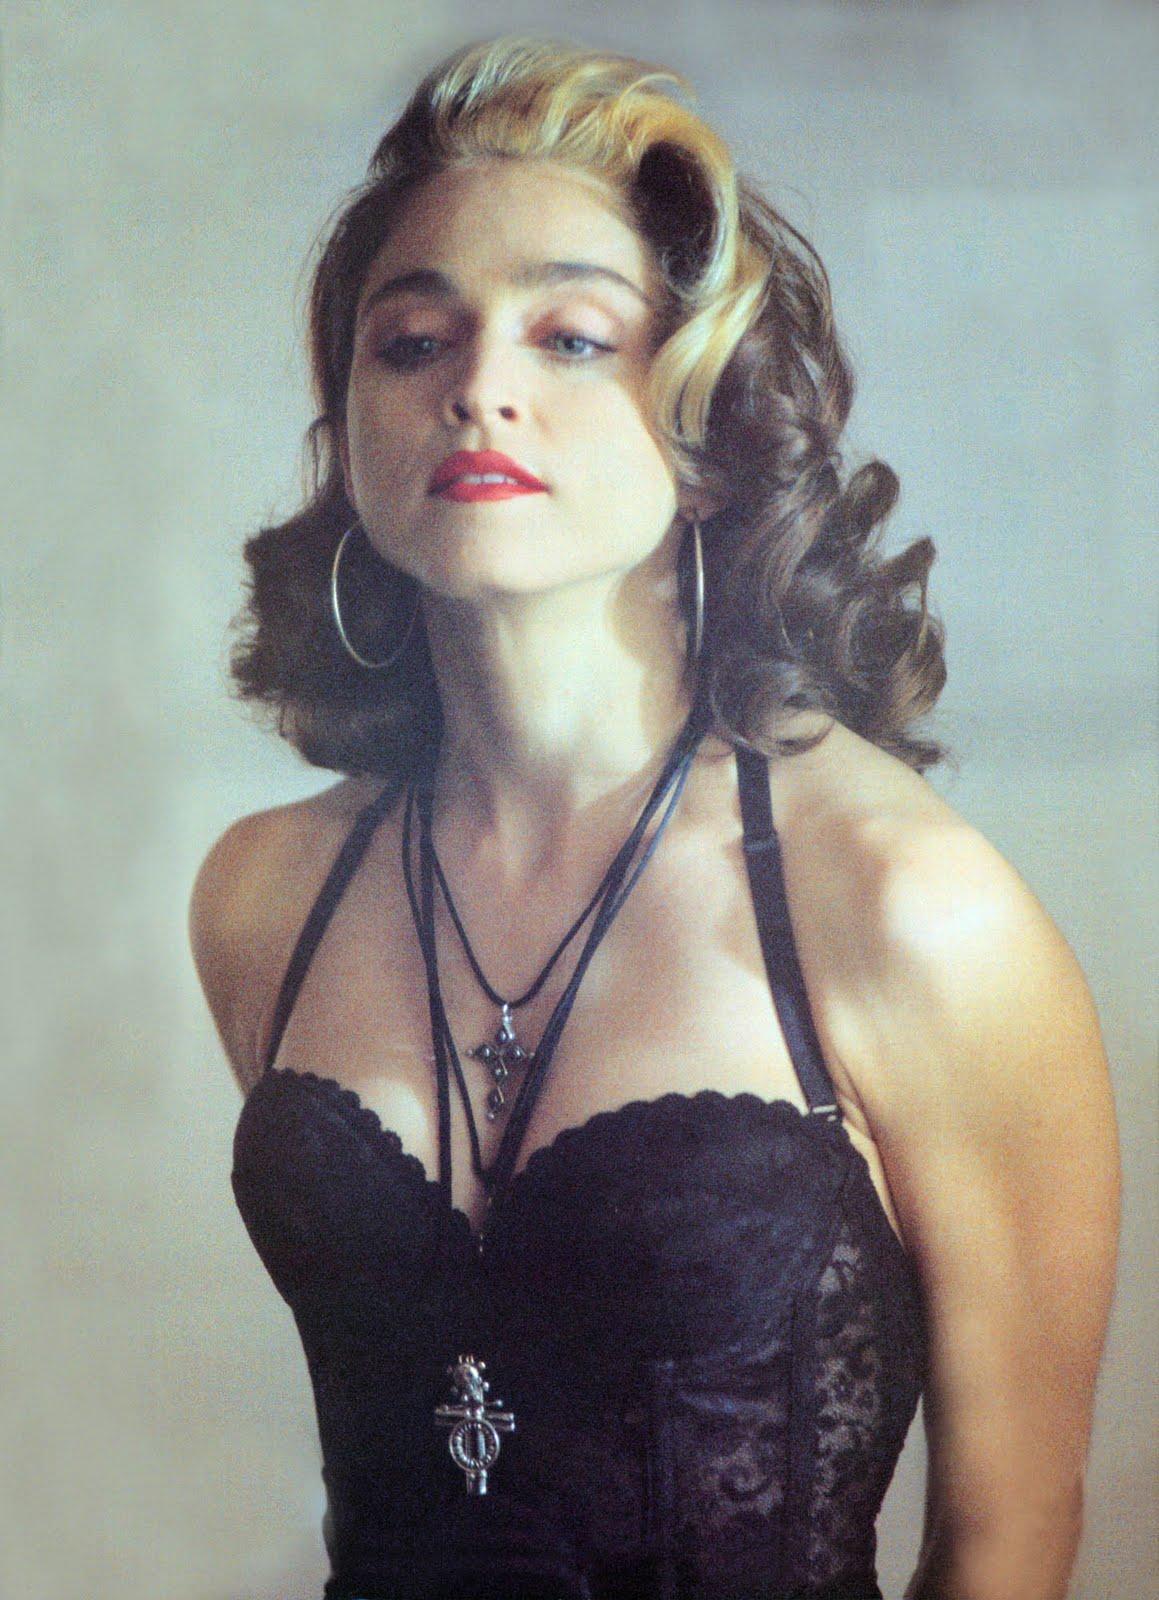 http://3.bp.blogspot.com/-hP8uoiRnpd8/TVaGntmy-_I/AAAAAAAABx4/5C44upy7-ik/s1600/pepsi-madonna-1989.jpg